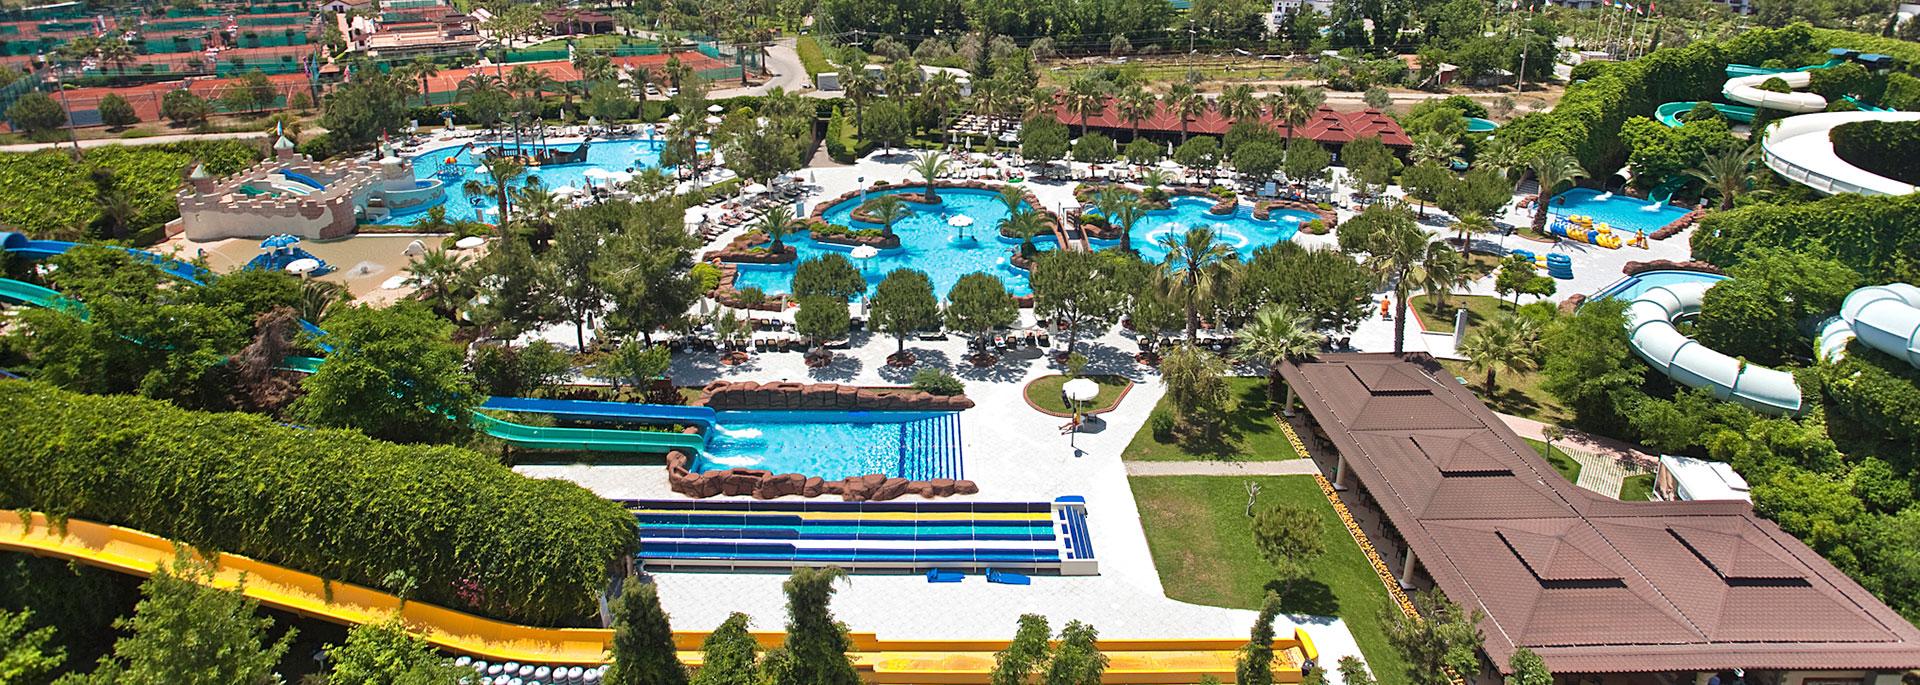 Аквапарк - Ali Bey Club Manavgat - Сиде, Анталии, Турция